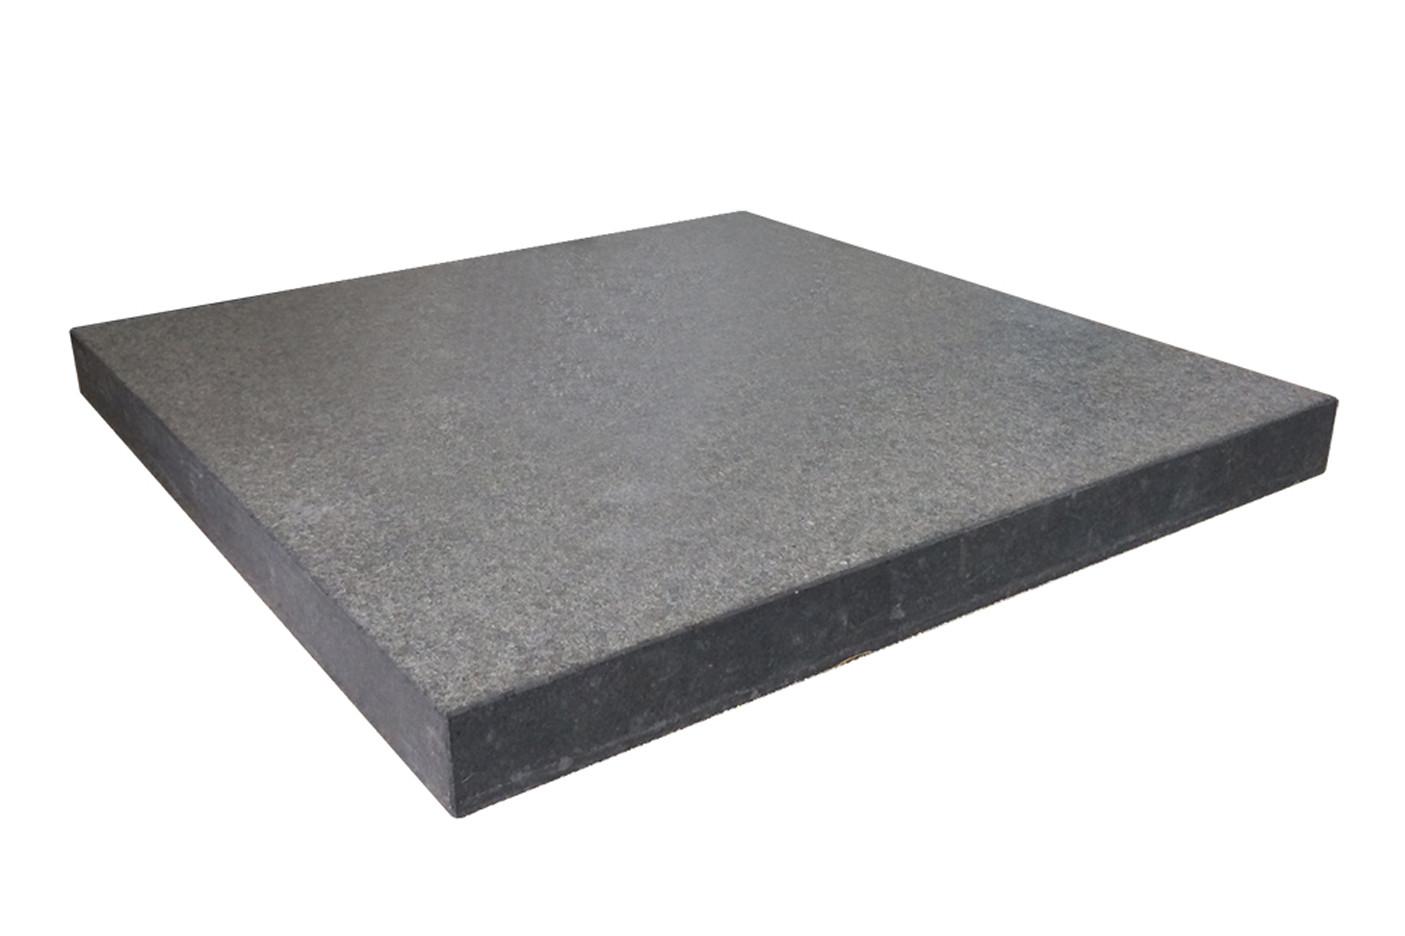 Sonnenschirmfuß 112mm Basalt (geflammt)